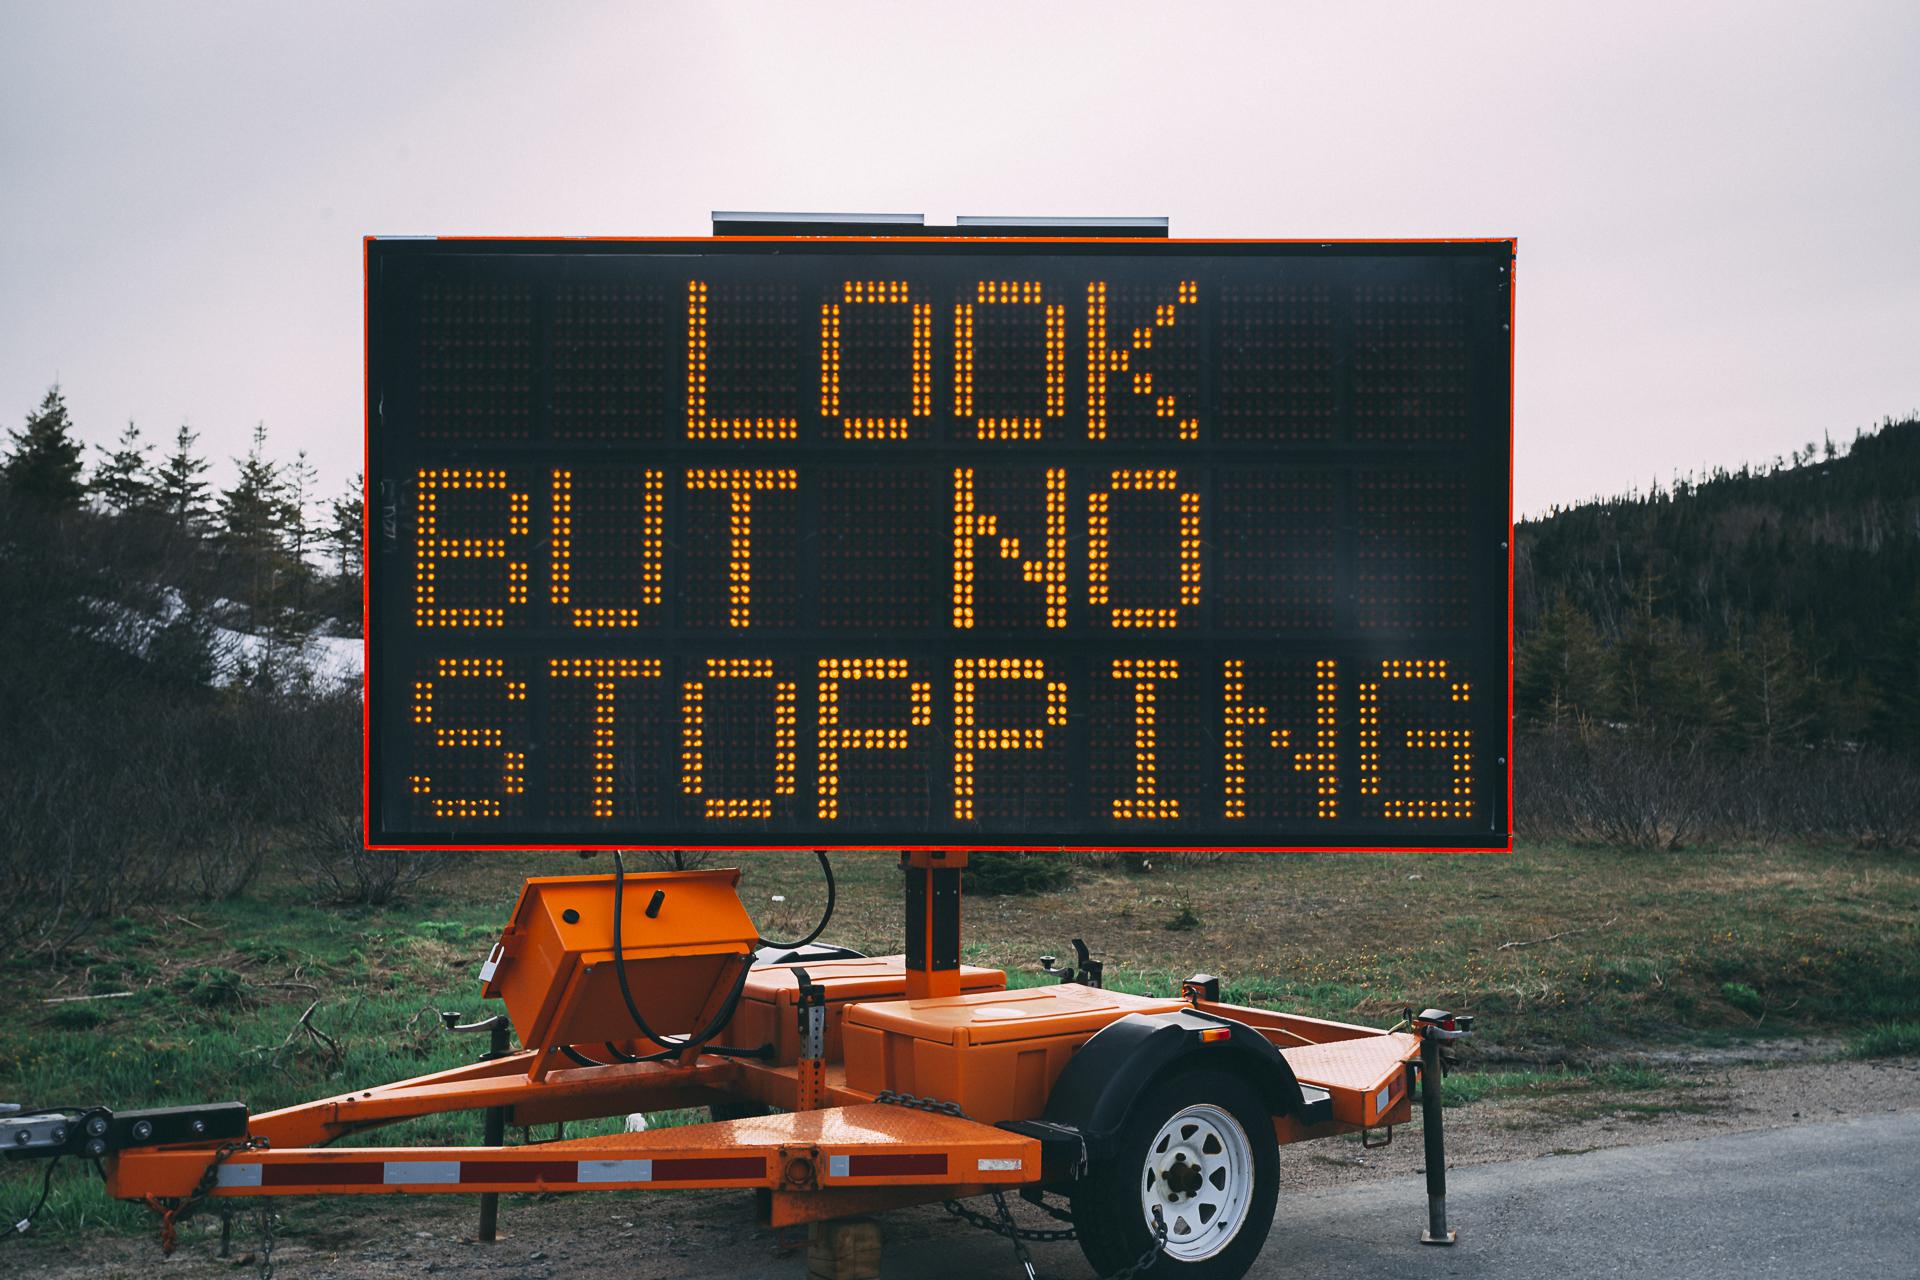 20190602-Newfoundland-look-but-no-stopping-jp-valery-aurelie-boucher-088.jpg